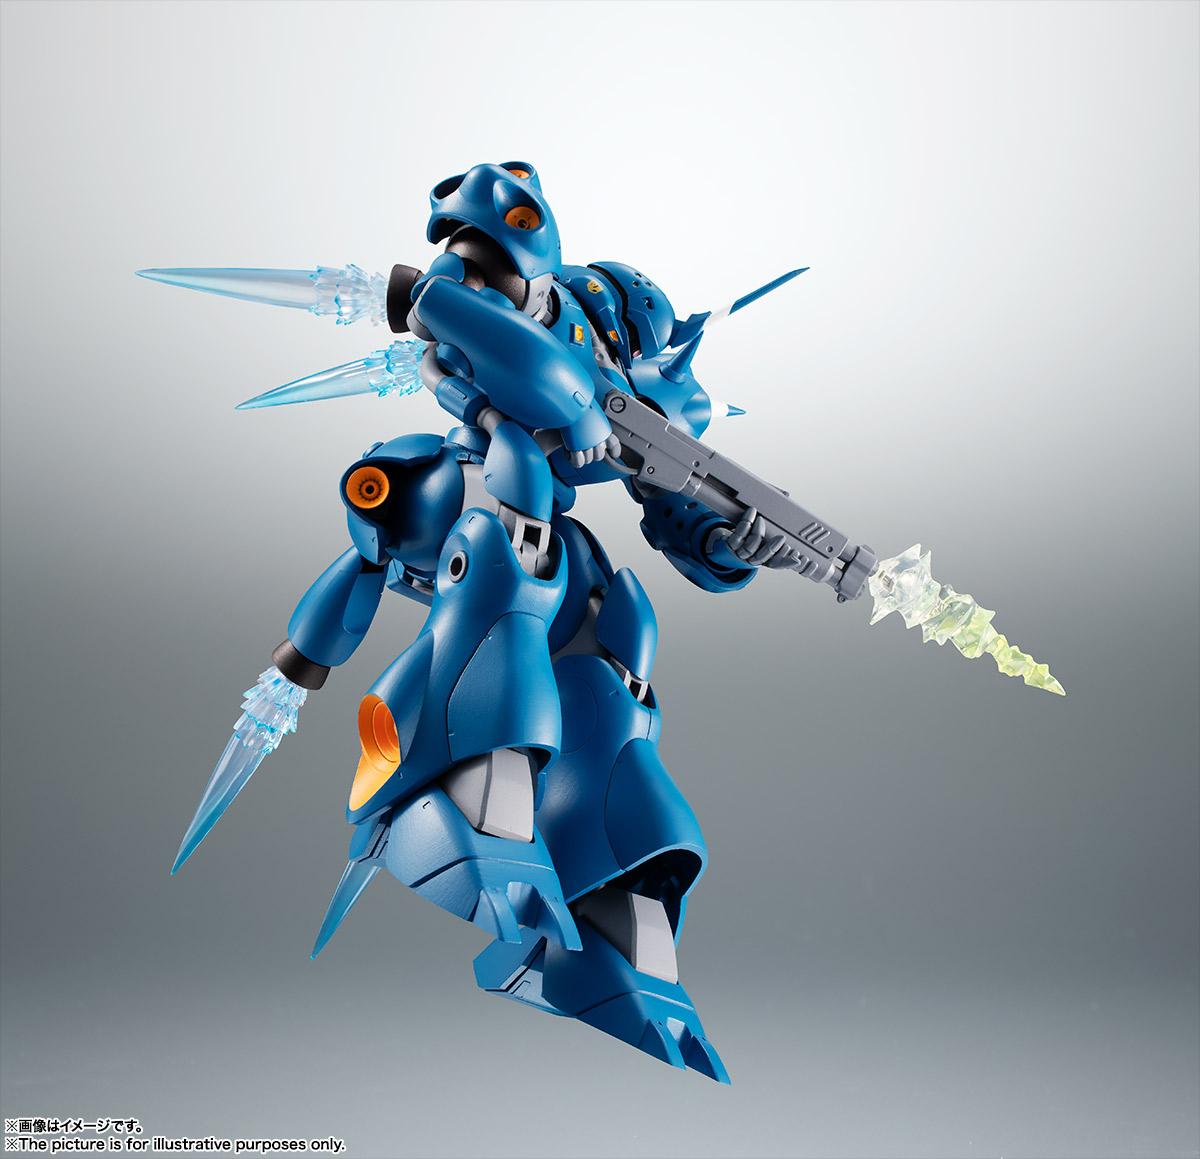 ROBOT魂〈SIDE MS〉『MS-18E ケンプファー ver. A.N.I.M.E.』機動戦士ガンダム0080 ポケットの中の戦争 可動フィギュア-006